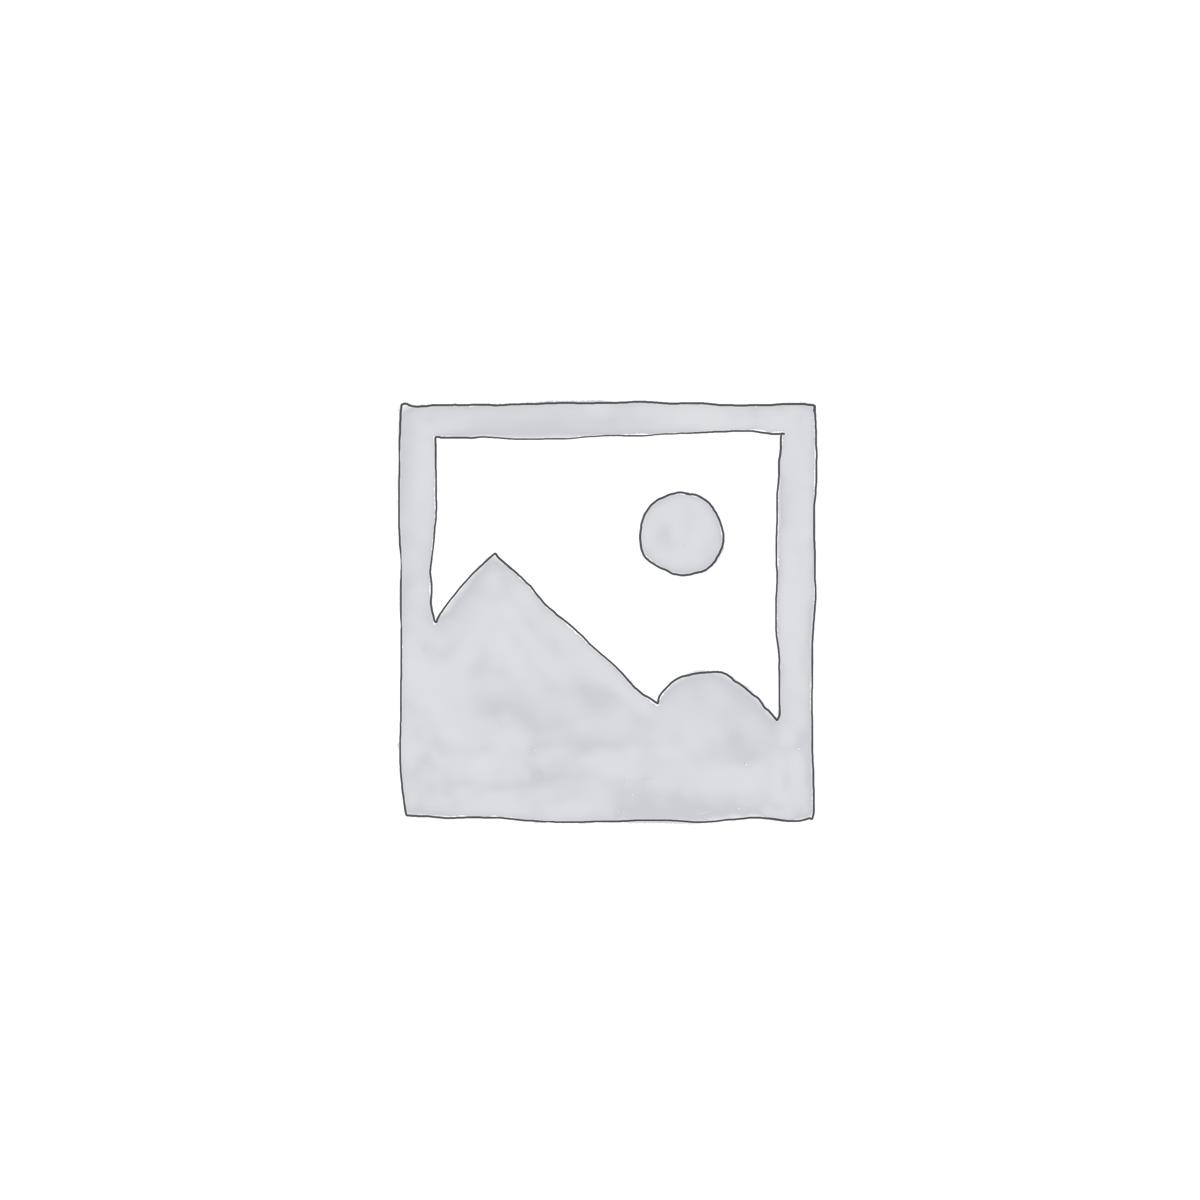 Kask SZCZĘKOWY Caberg DUKE II Szary Mat L PINLOCK